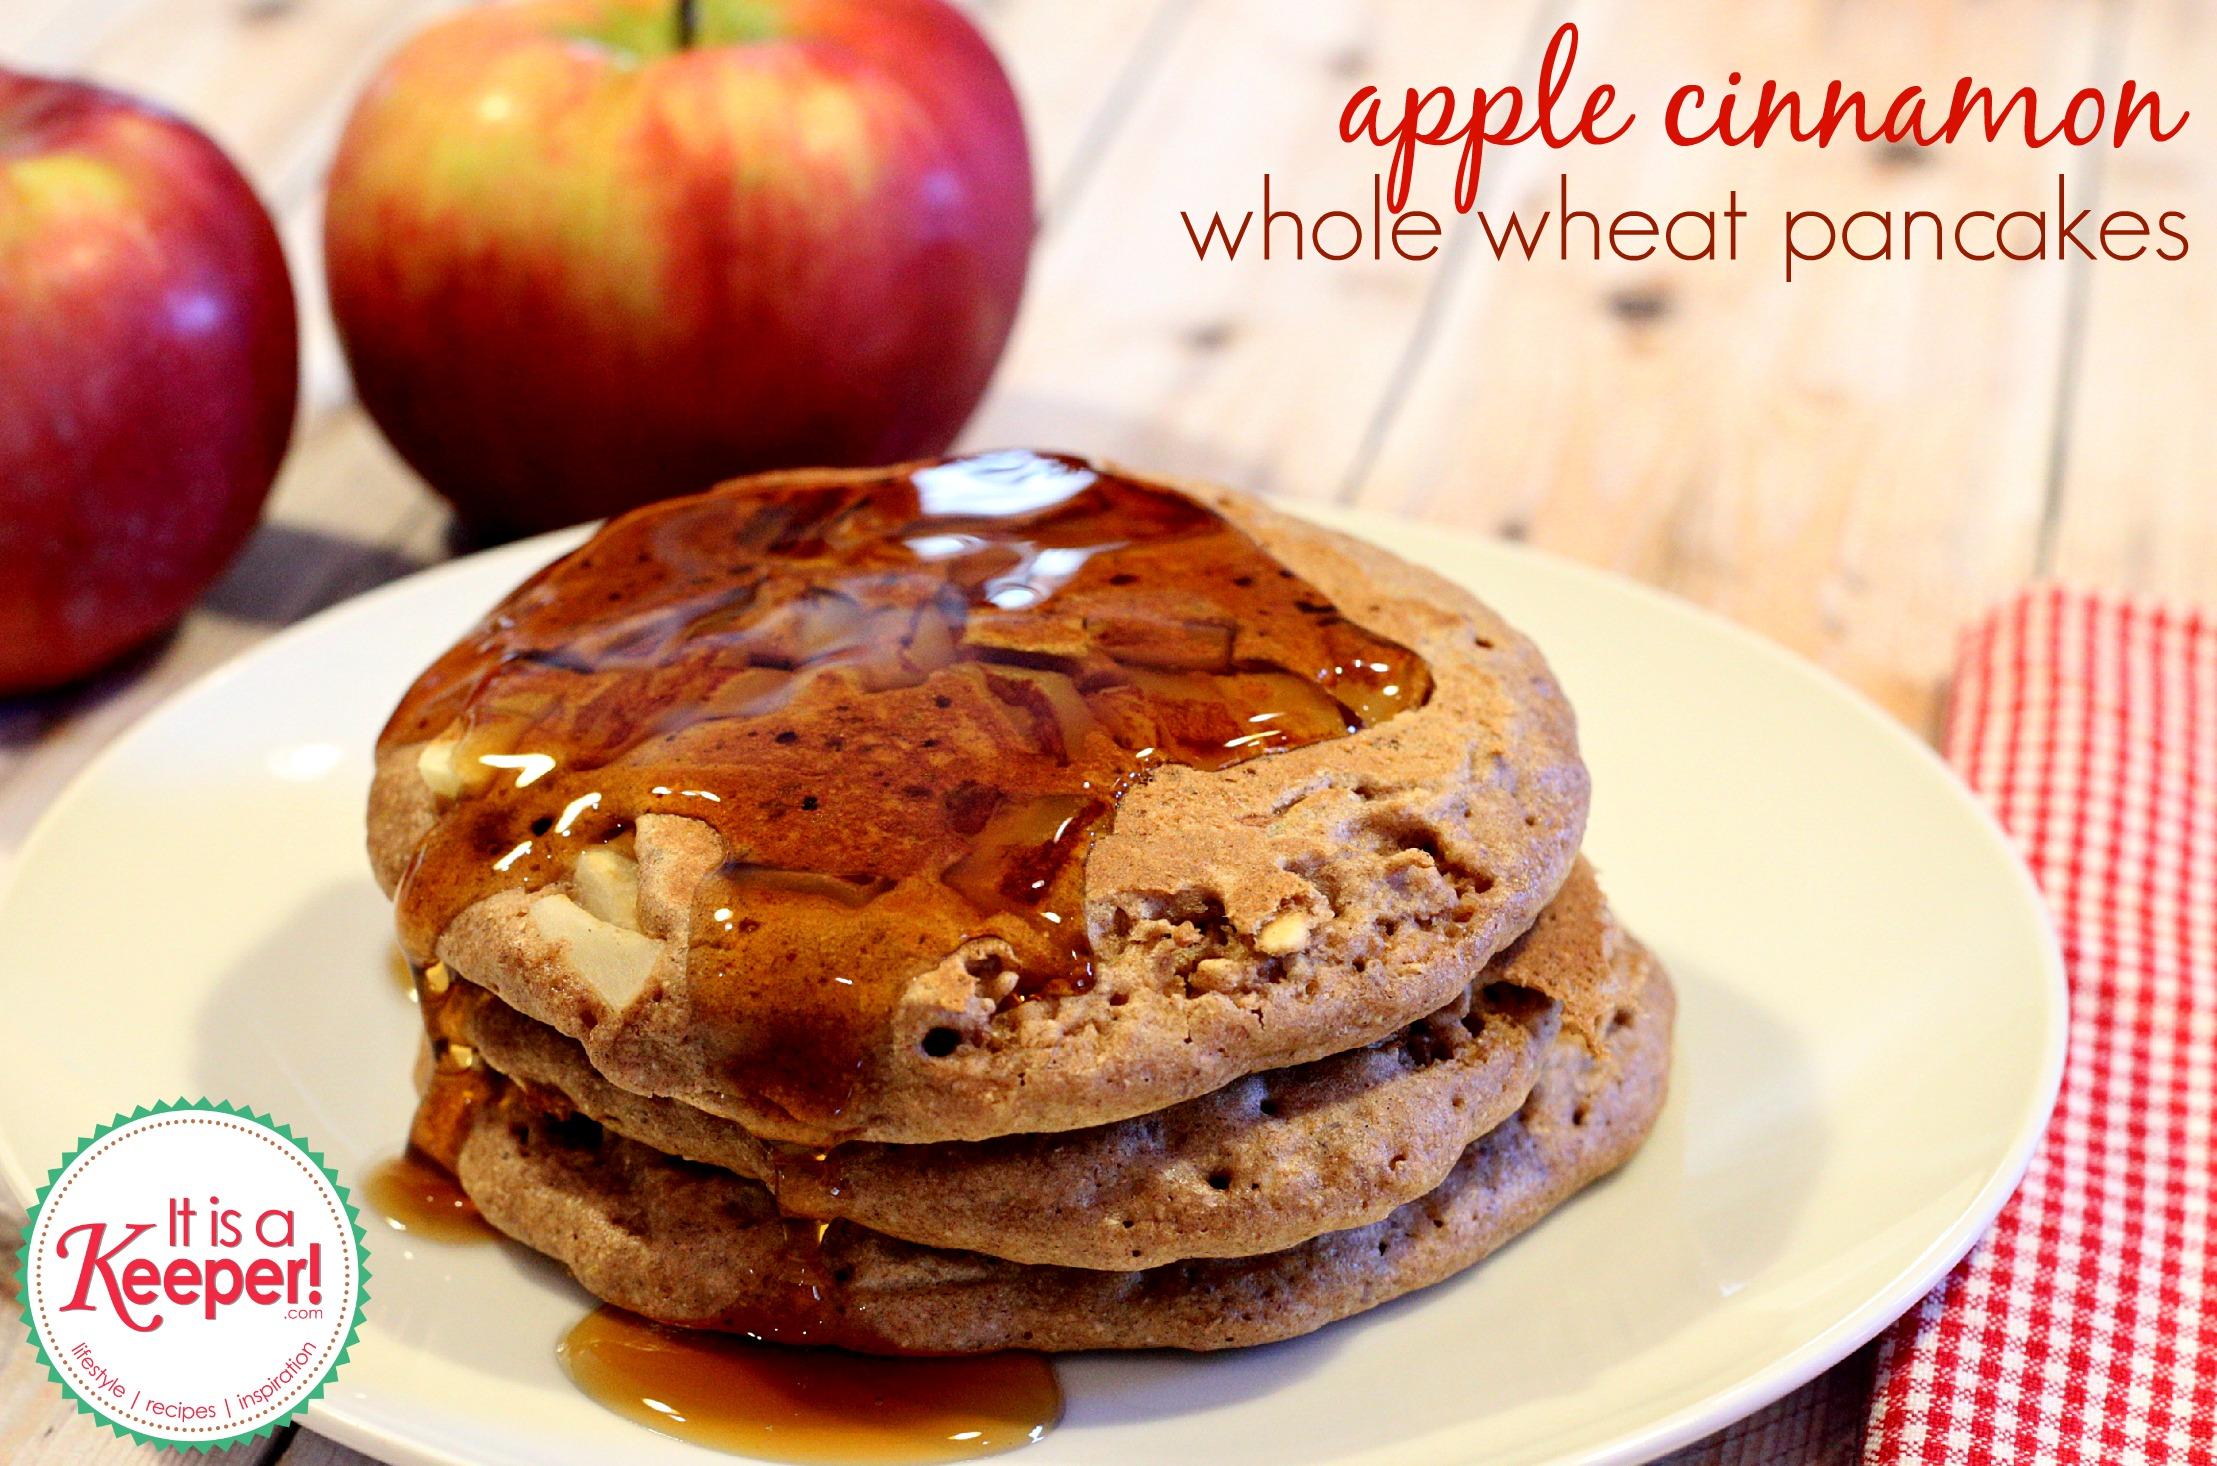 Apple Cinnamon Whole Wheat Pancakes